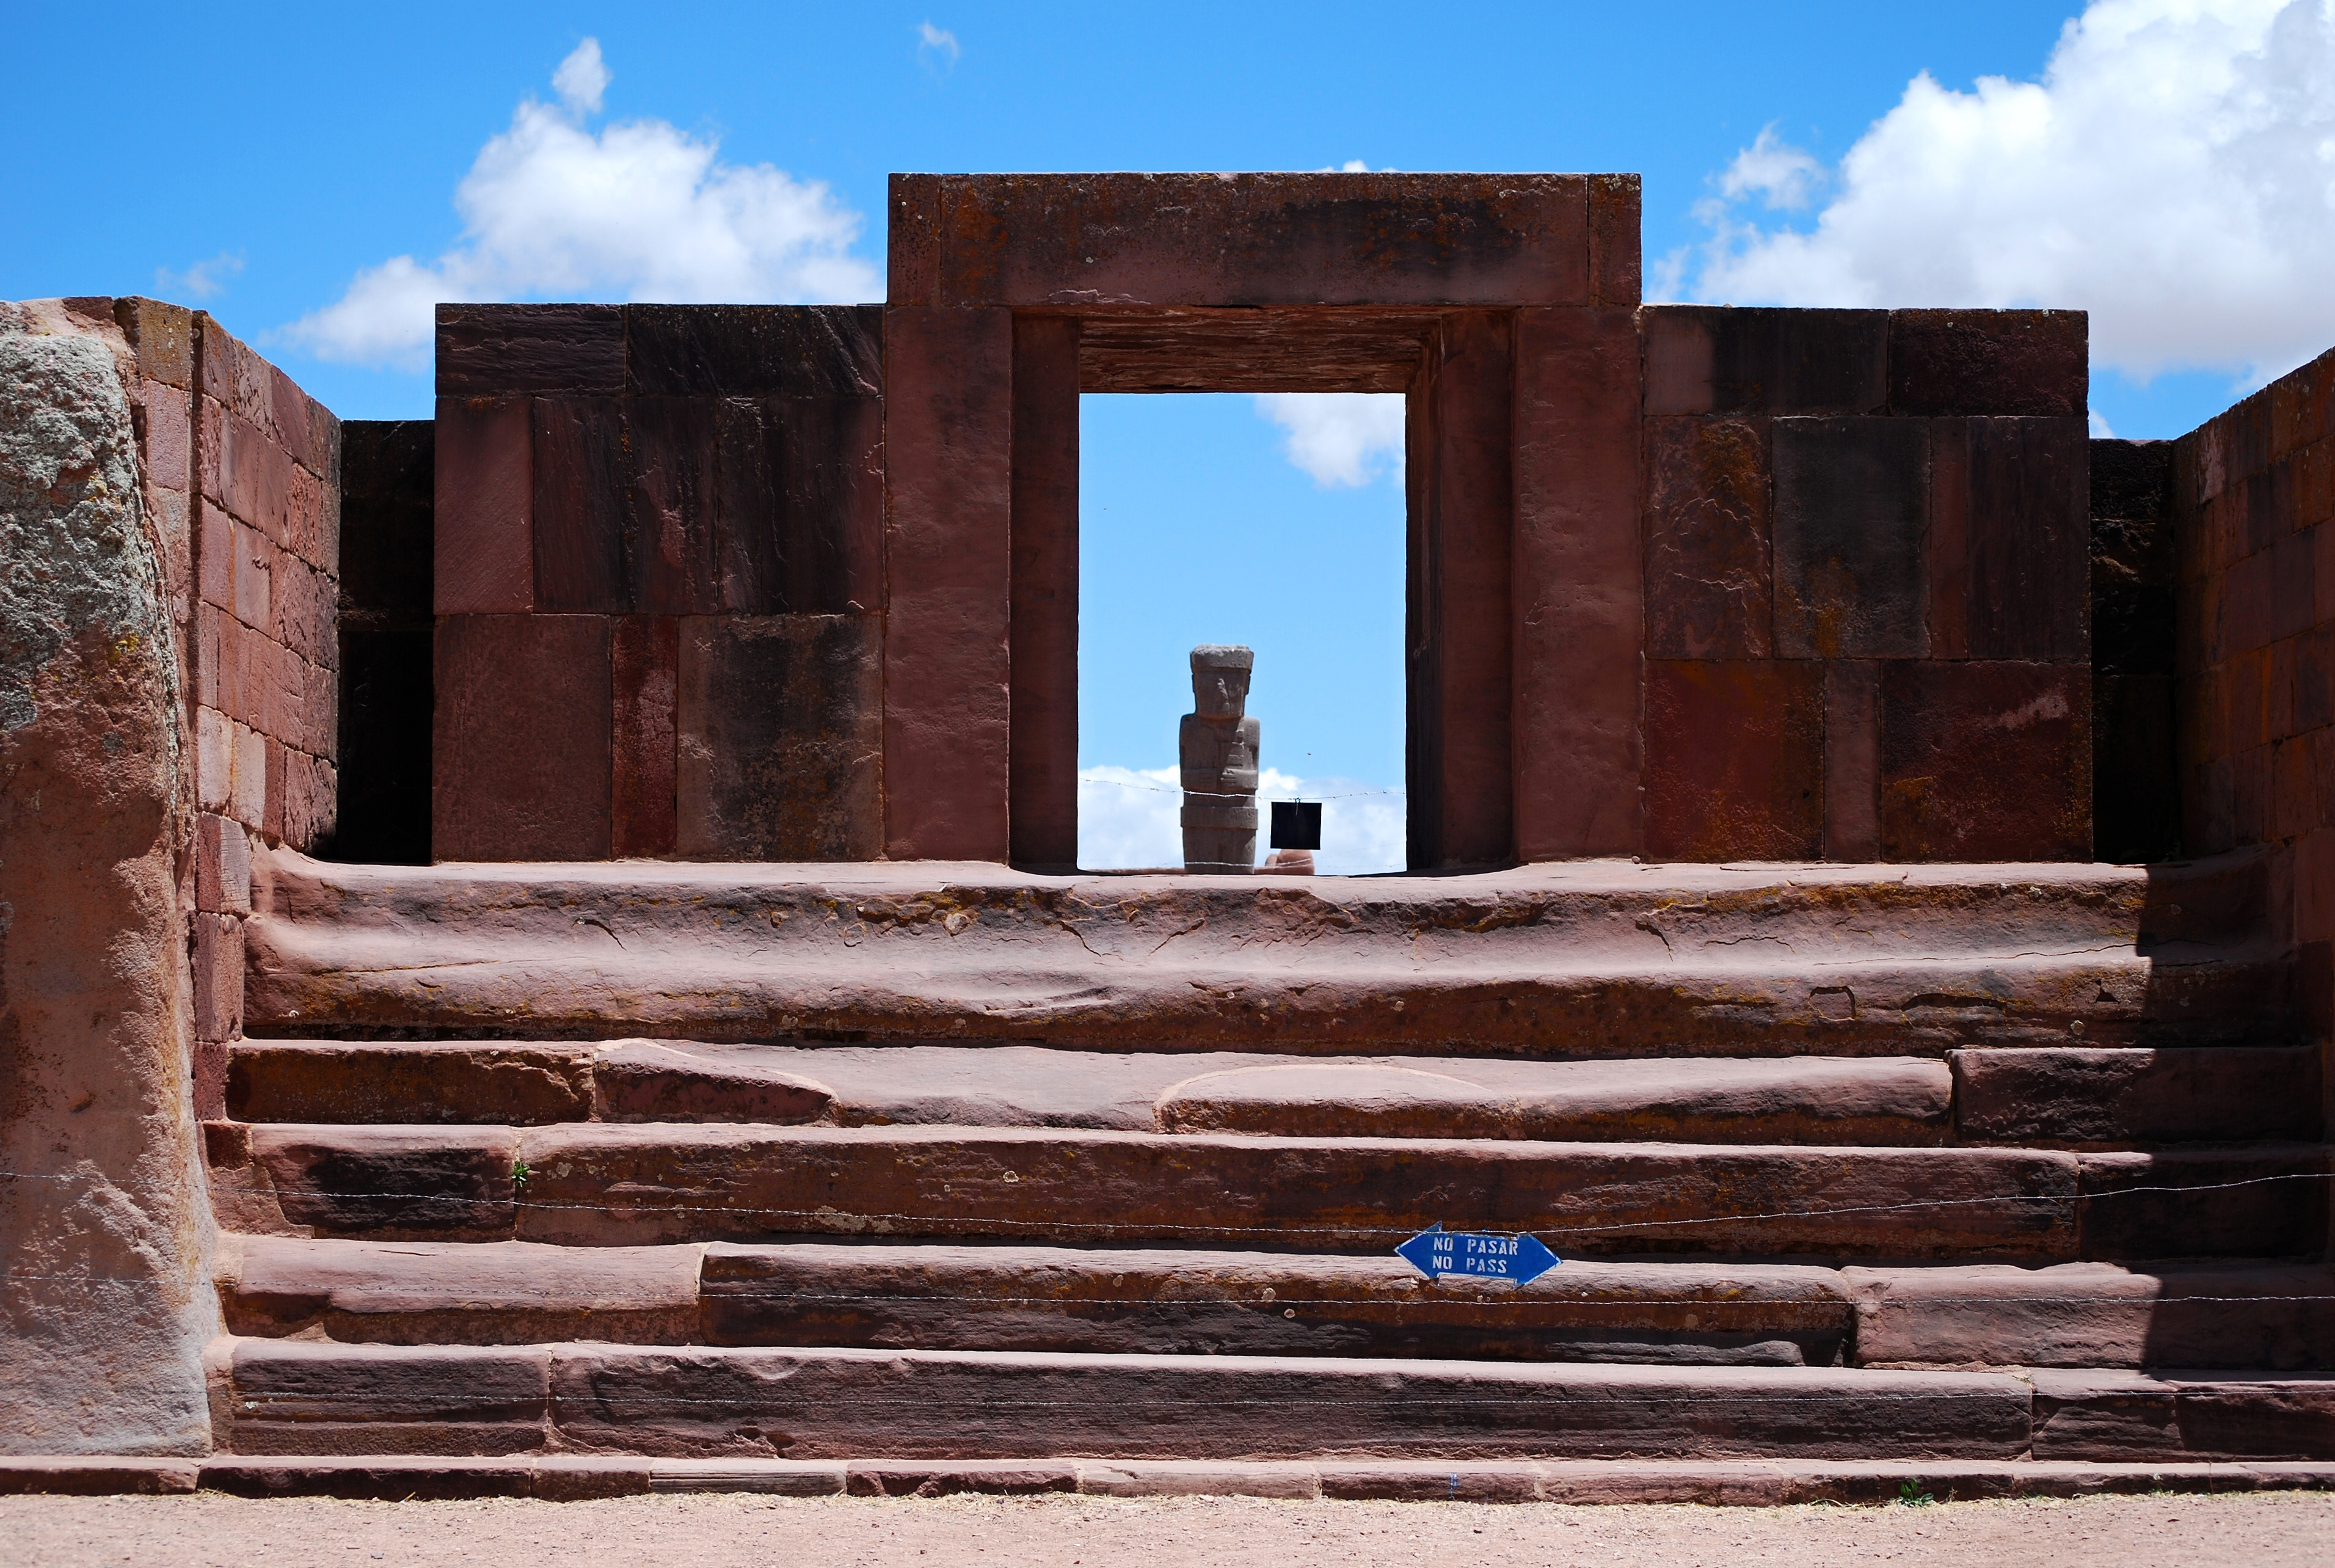 Templo de Kalasasaya a socha Monolito Ponce - Tiwanaku - panoramio.jpg